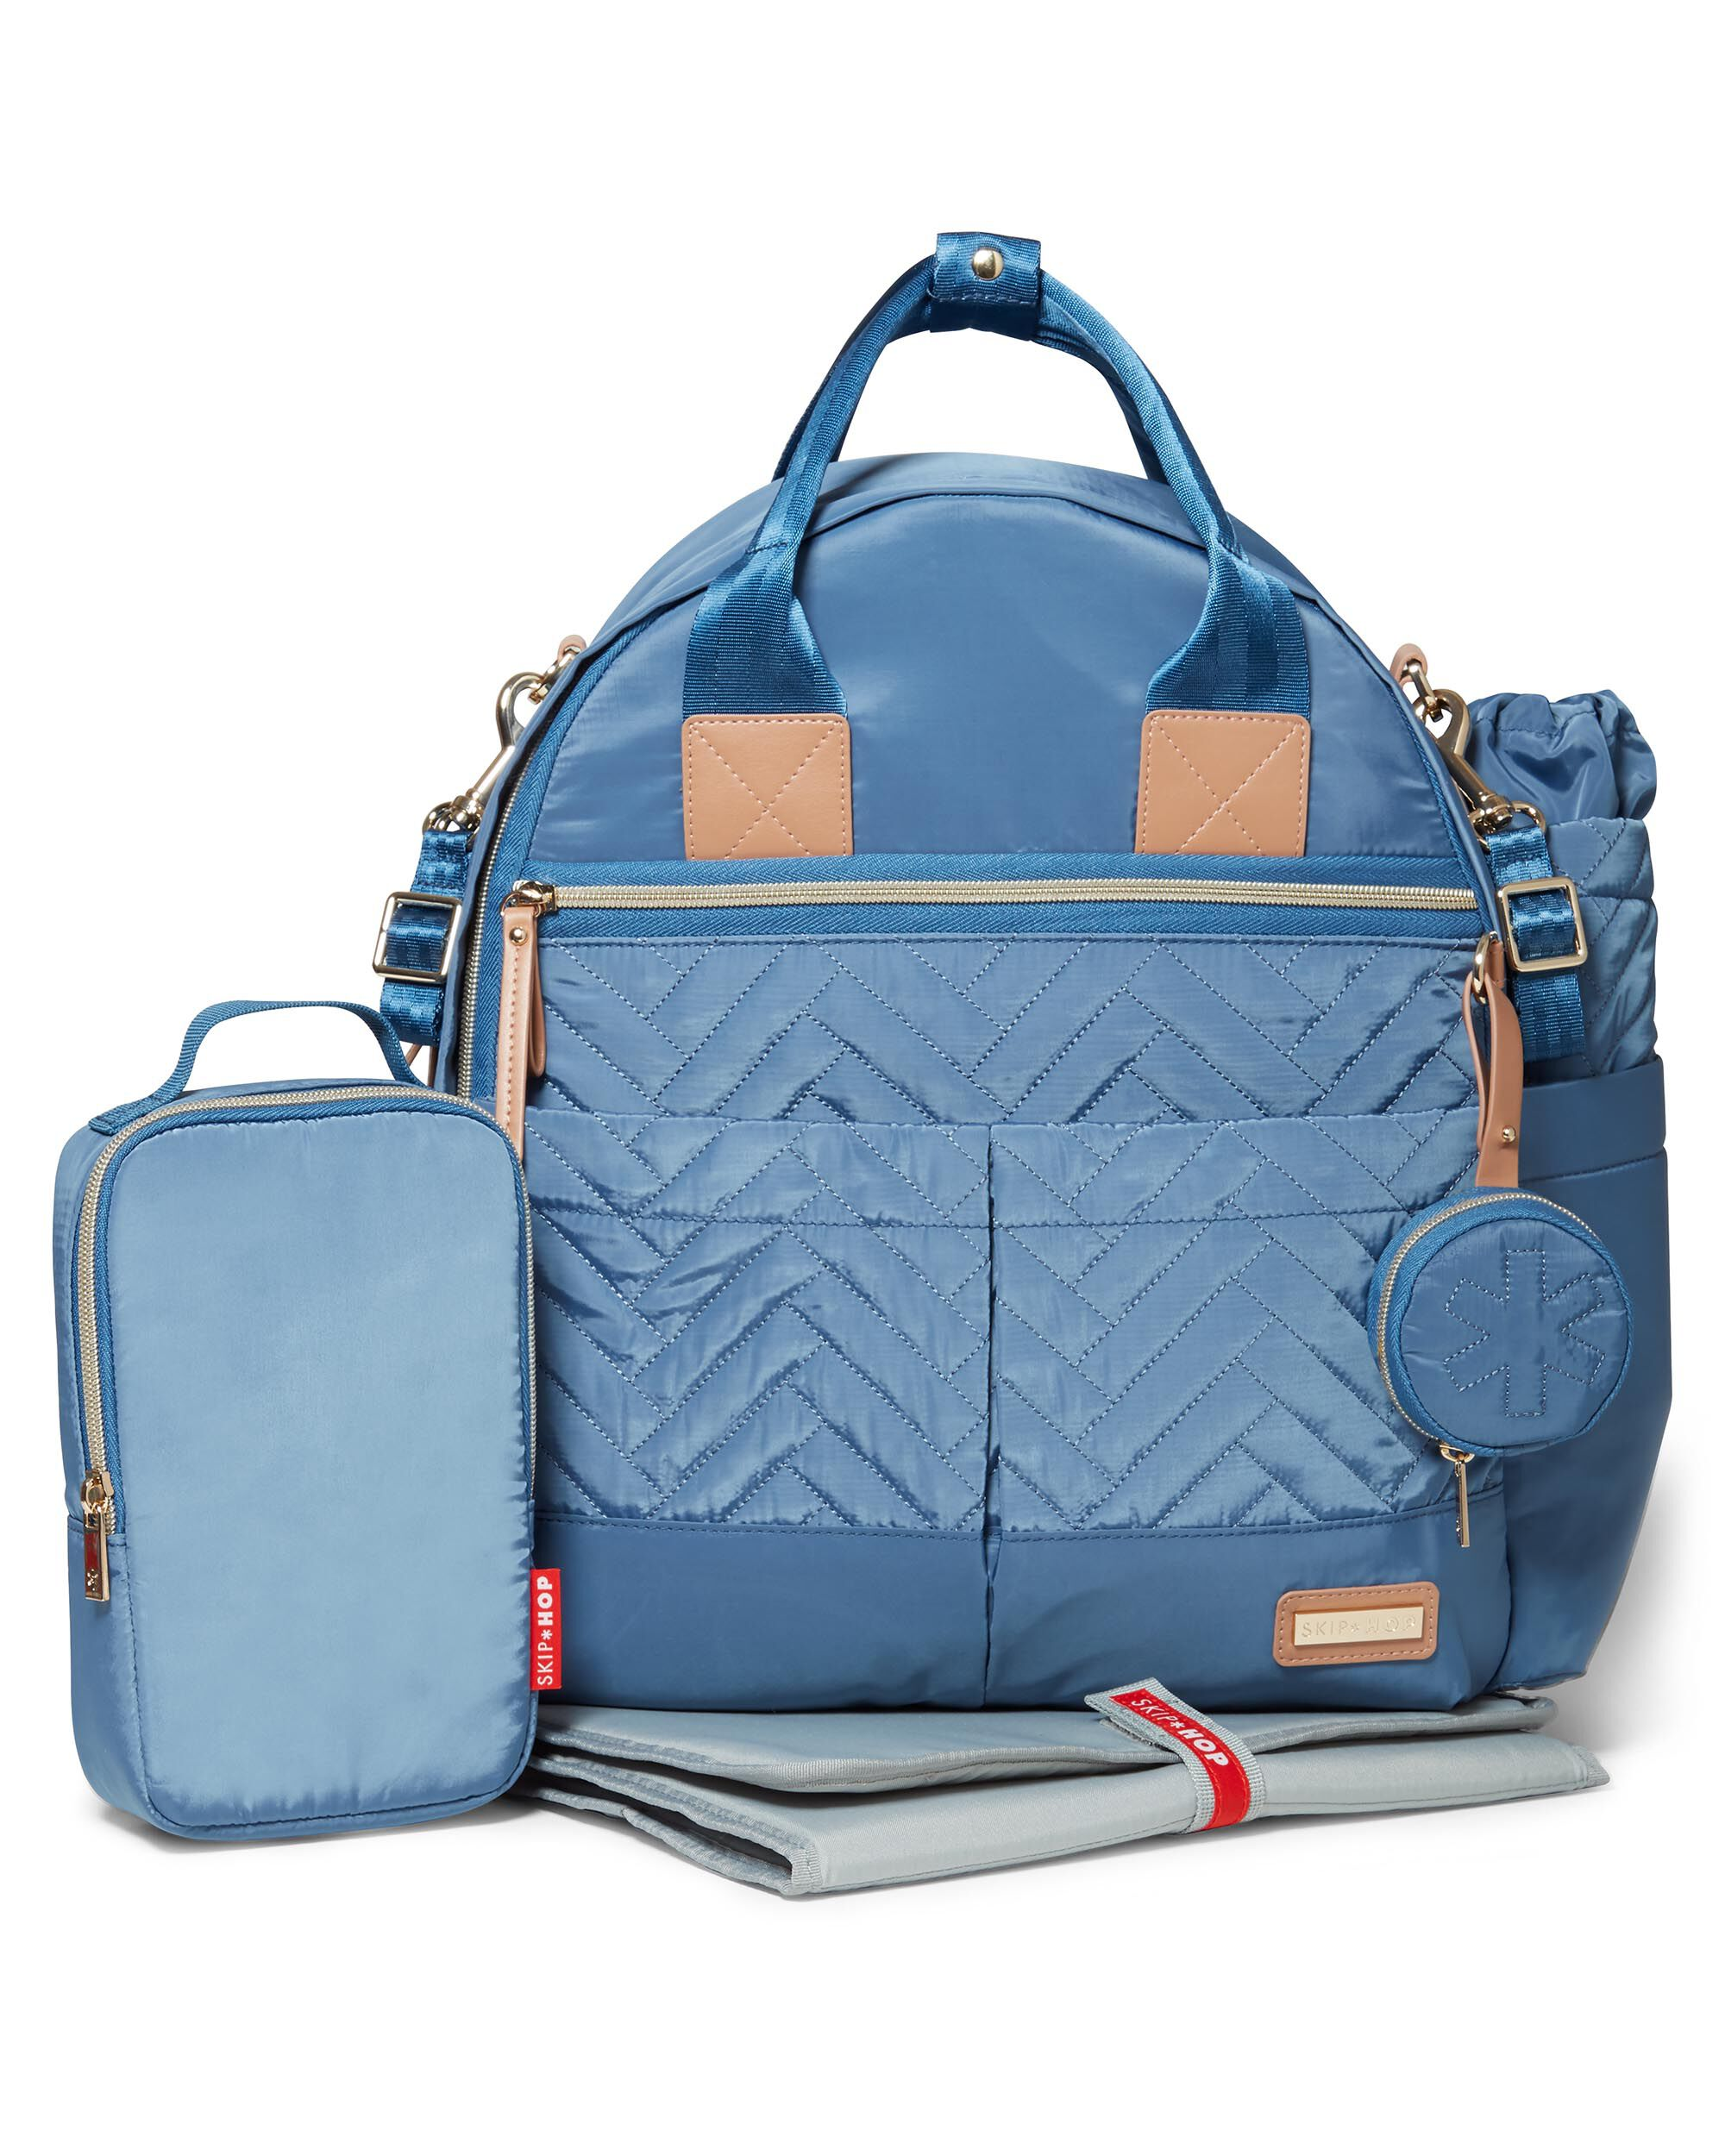 51ab18db94c6 ... Suite by Skip Hop 6-in-1 Diaper Backpack Set ...